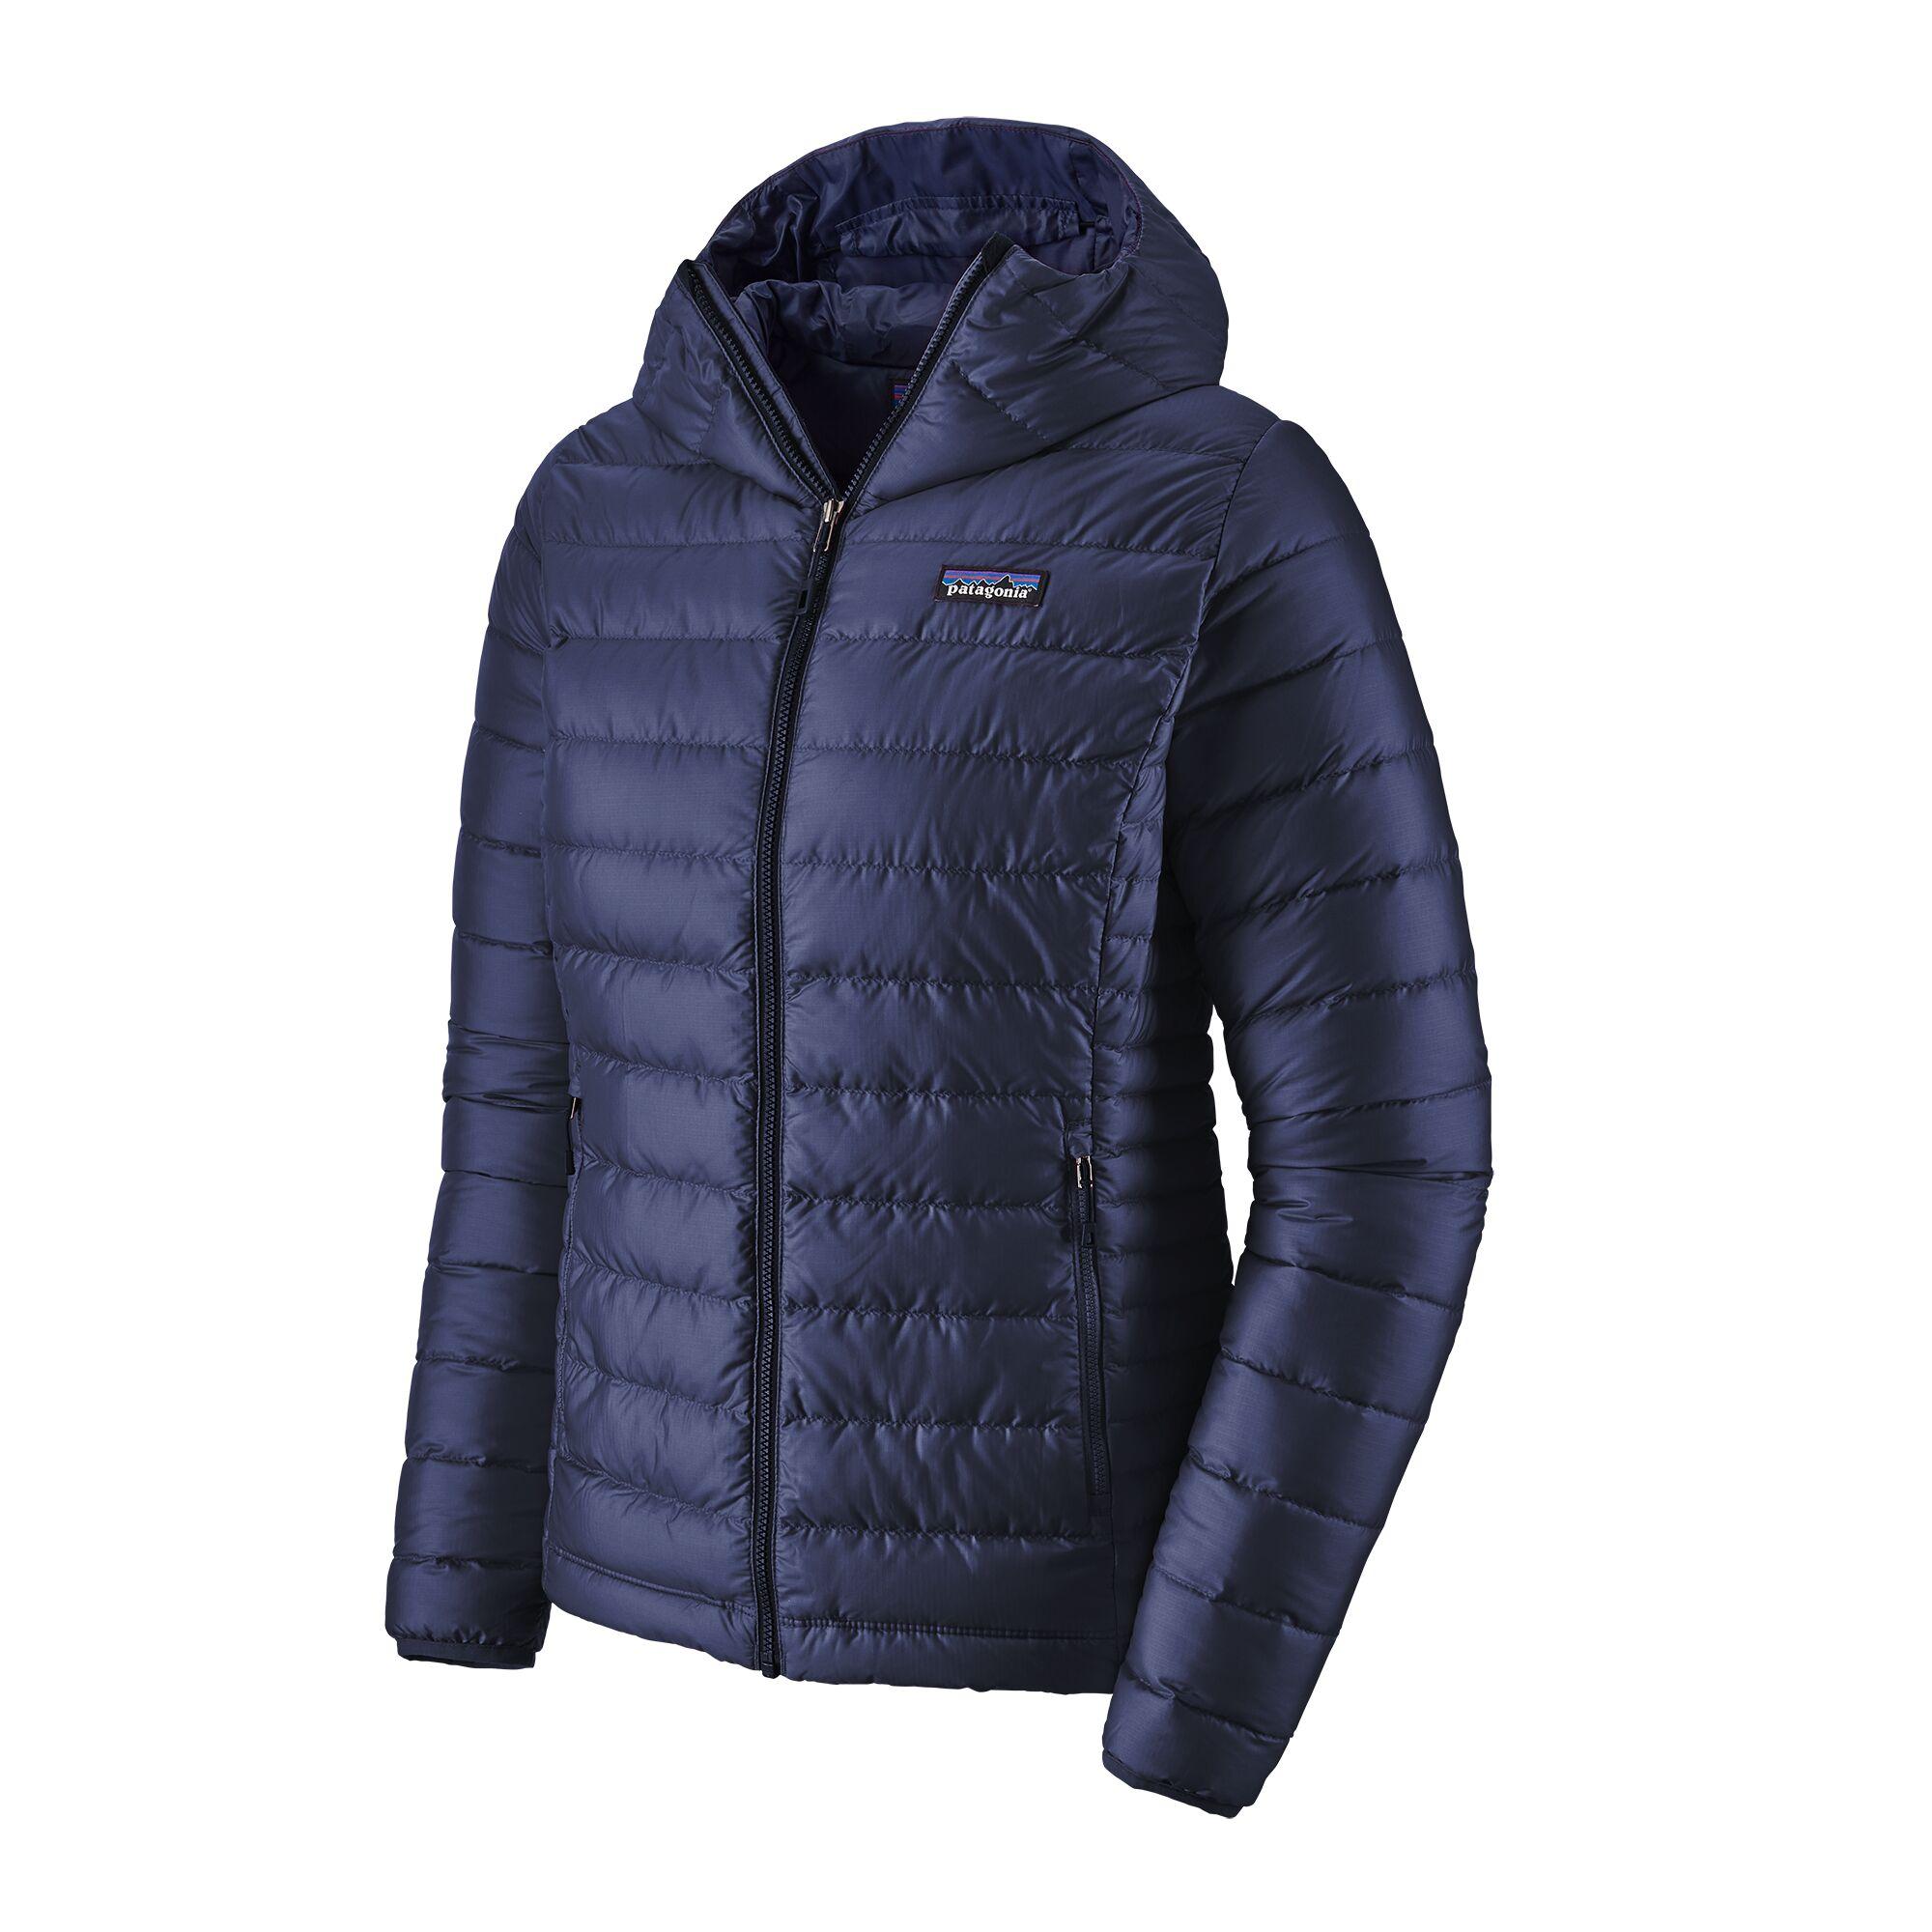 Patagonia - Down Sweater Hoody - Chaqueta de plumas - Mujer